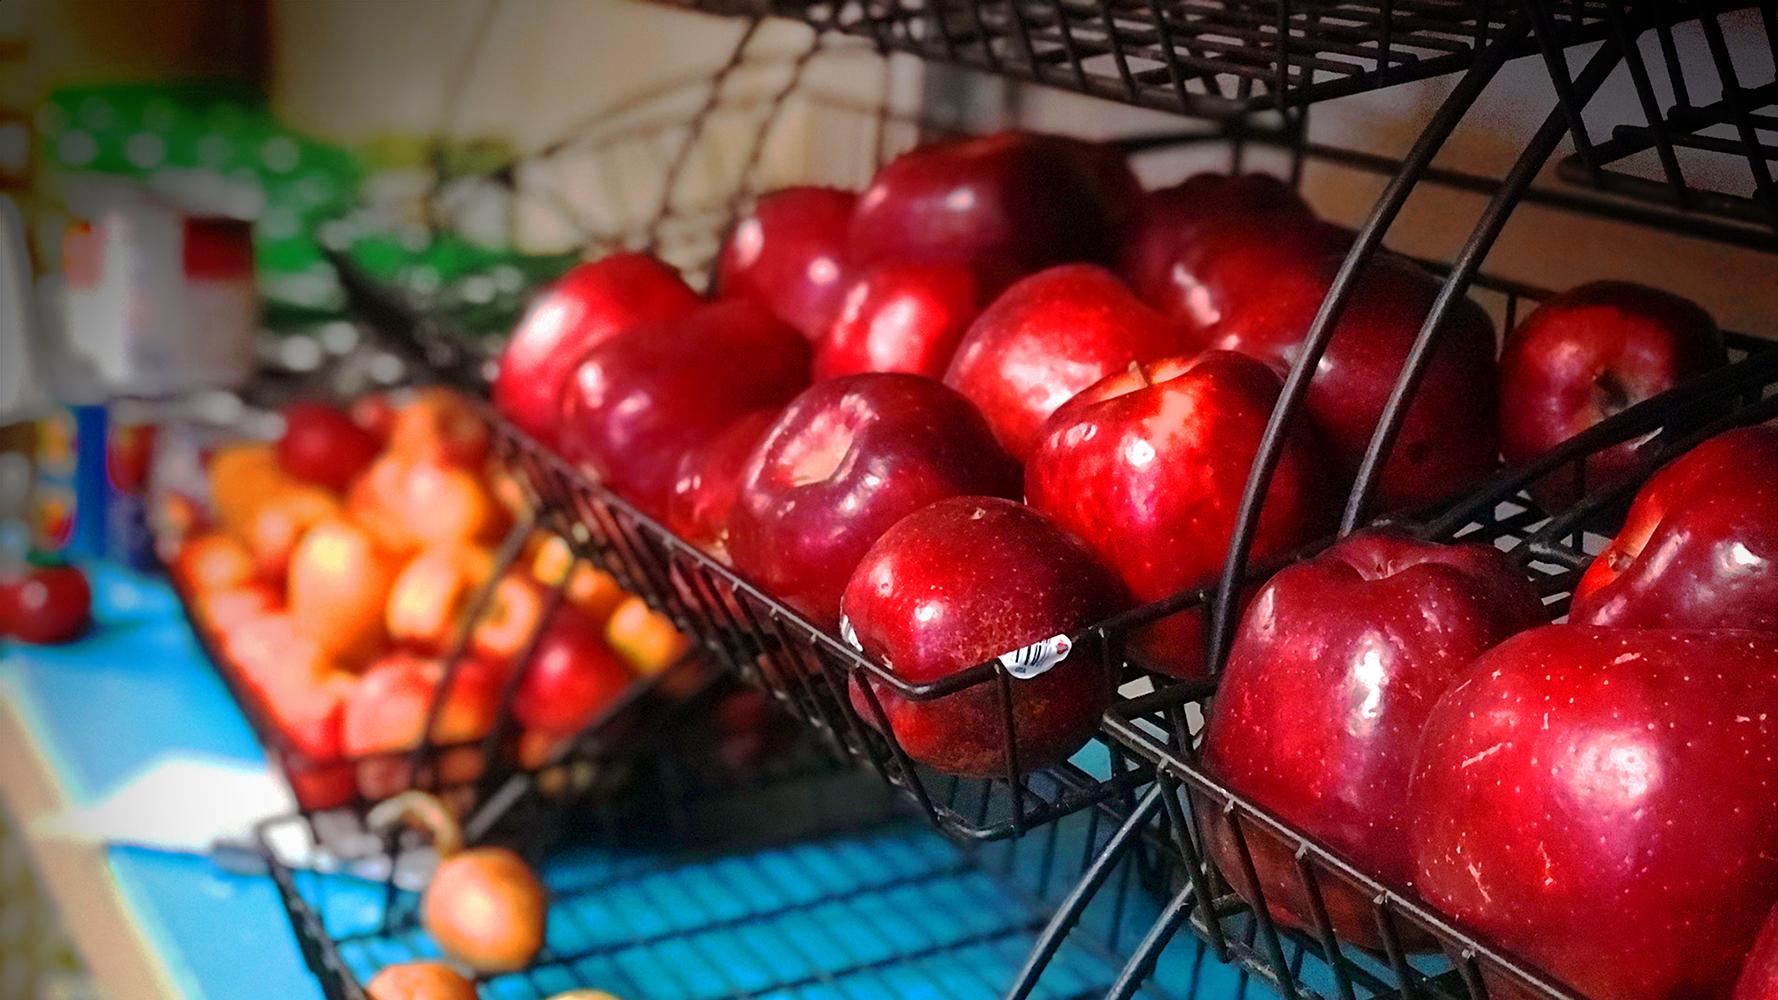 A basket of apples in a food shelf